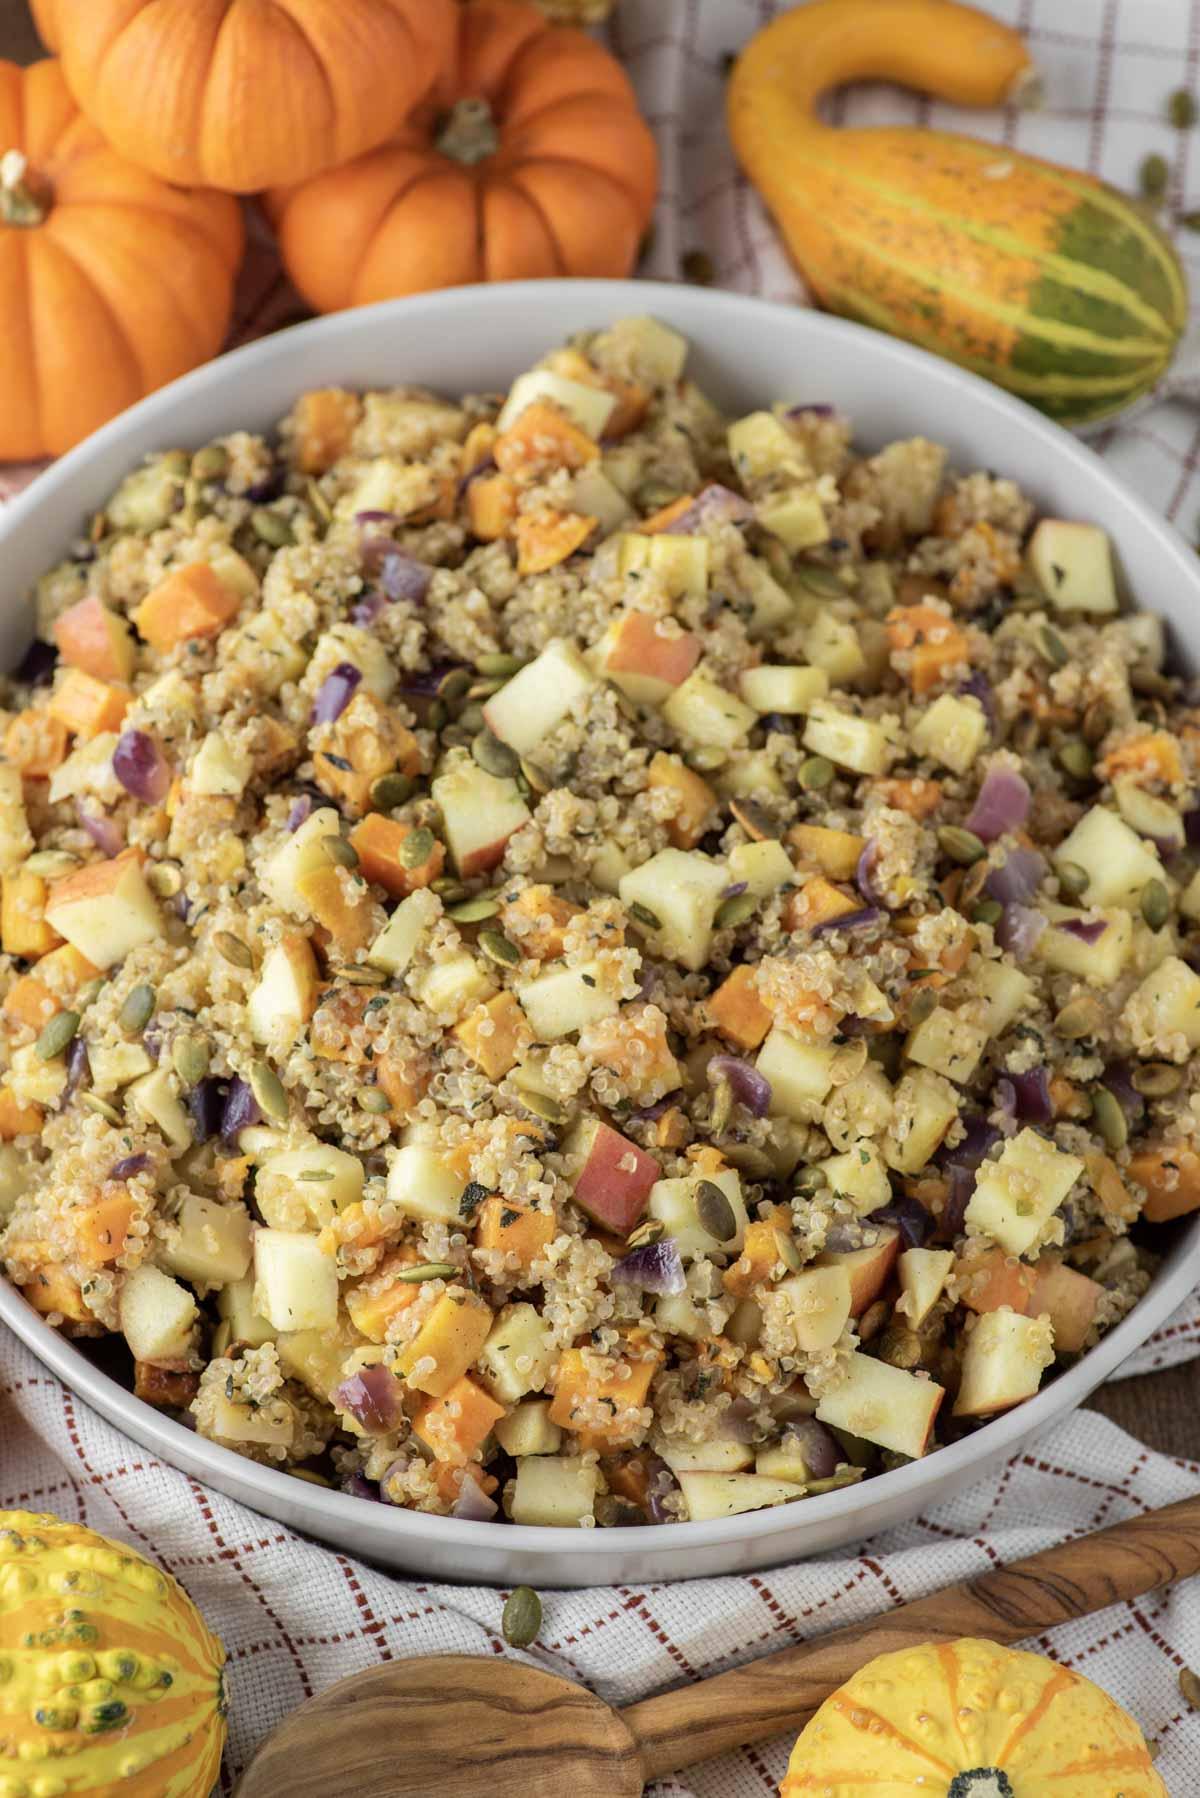 thanksgiving salad in grey bowl